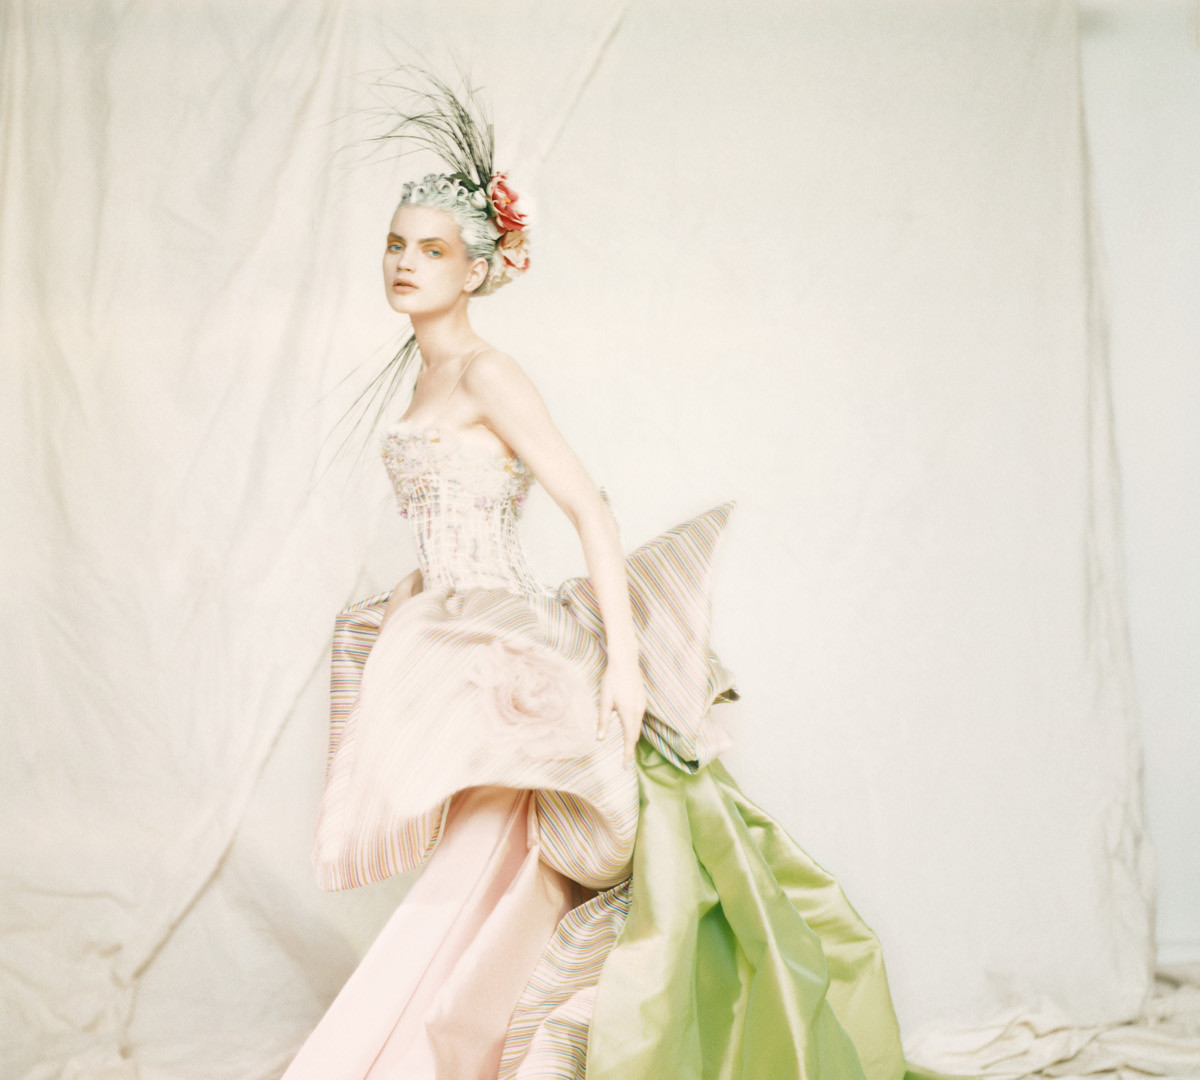 Paolo Roversi, Guinevere in a Nina Ricci Haute Couture dress, Paris, 1996